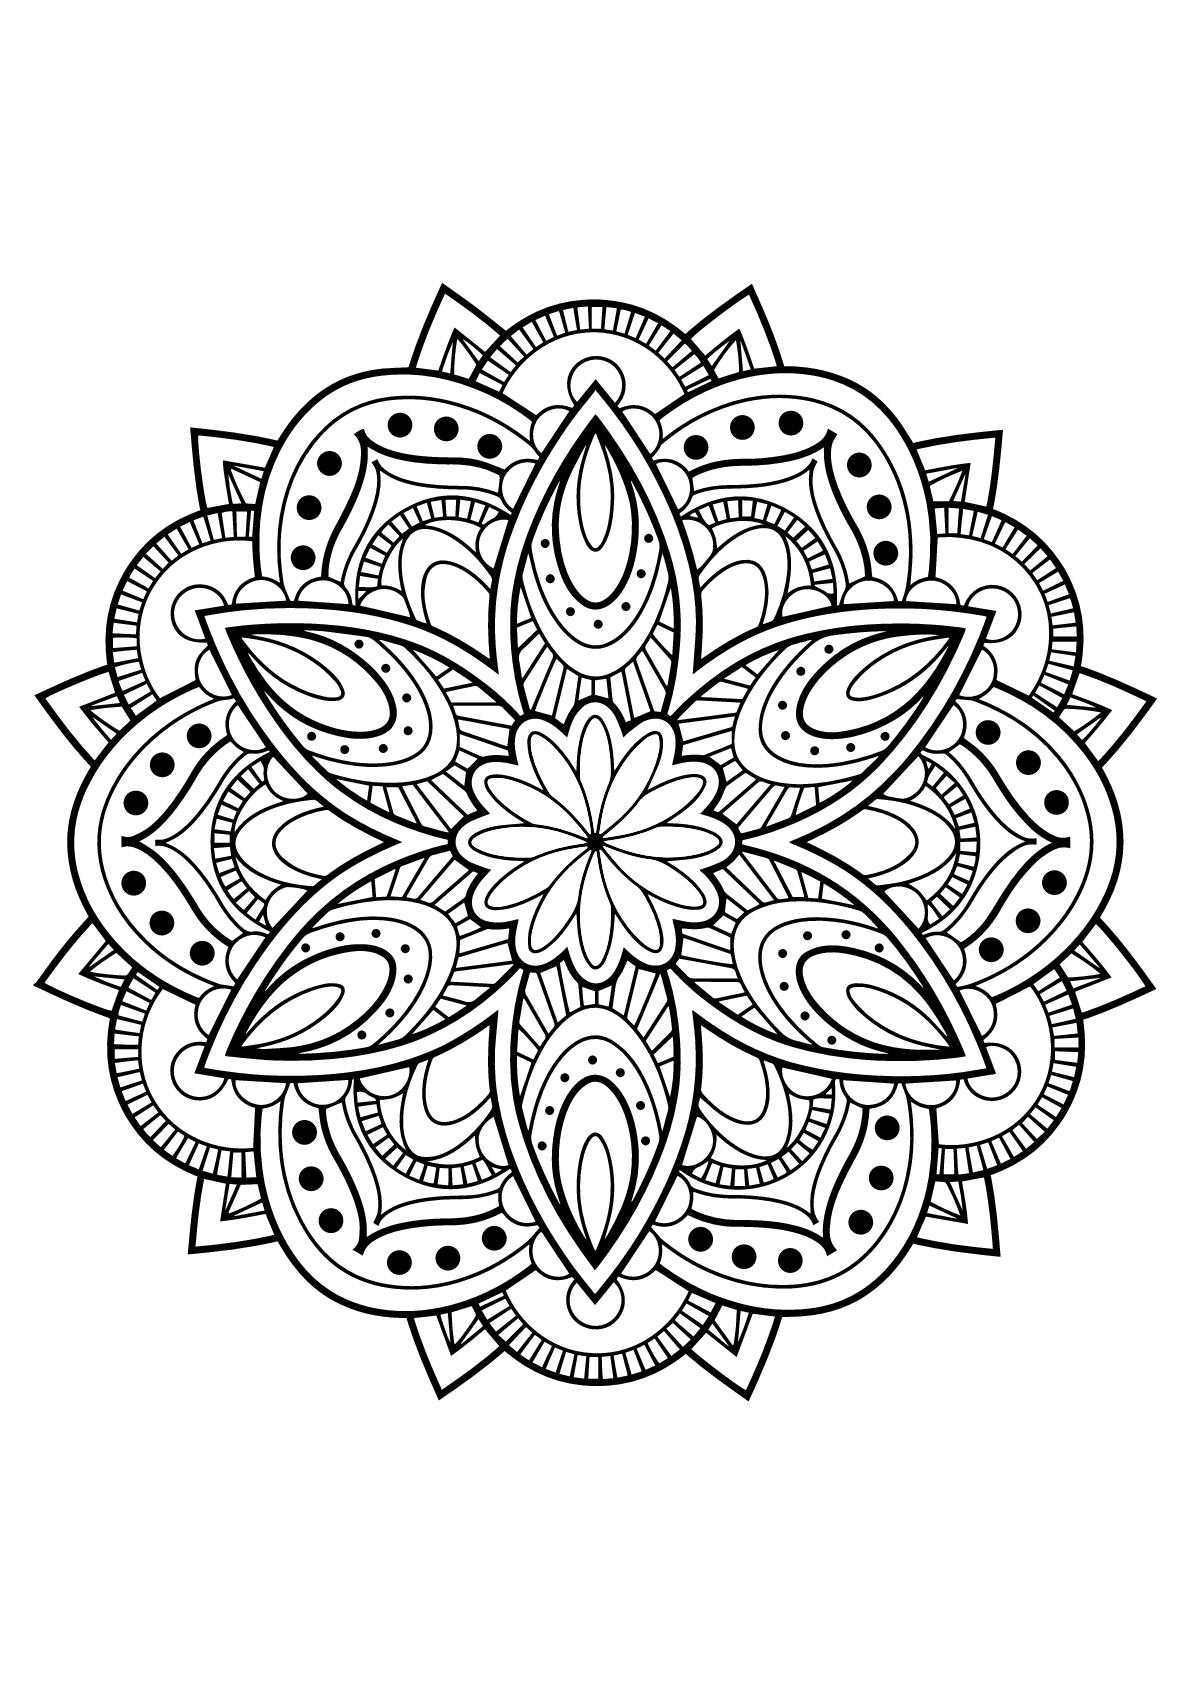 Mandalas 64677 Mandalas Disegni Da Colorare Per Adulti